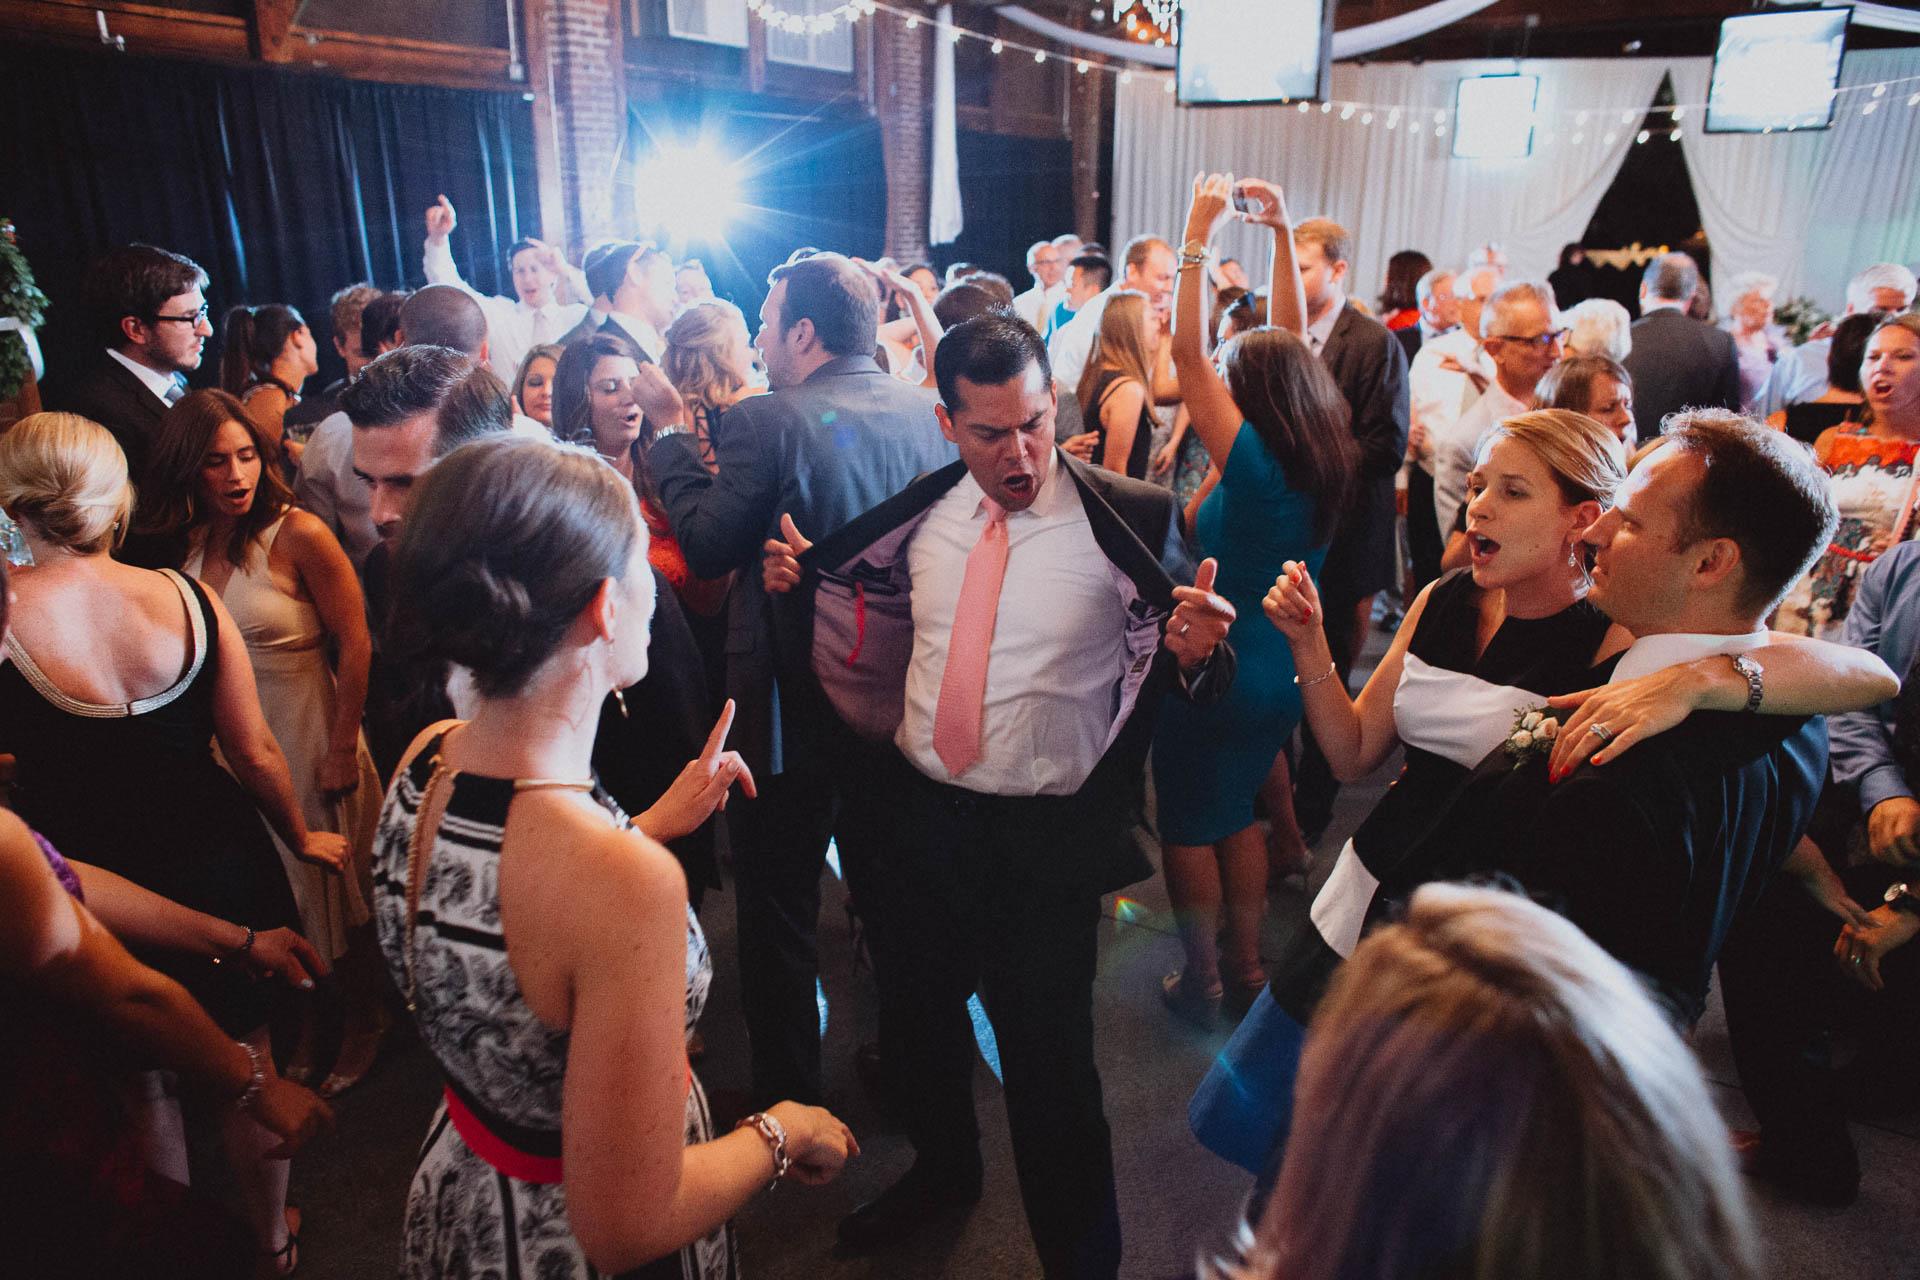 Keri-Joseph-Top-of-the-Market-Wedding-197@2x.jpg